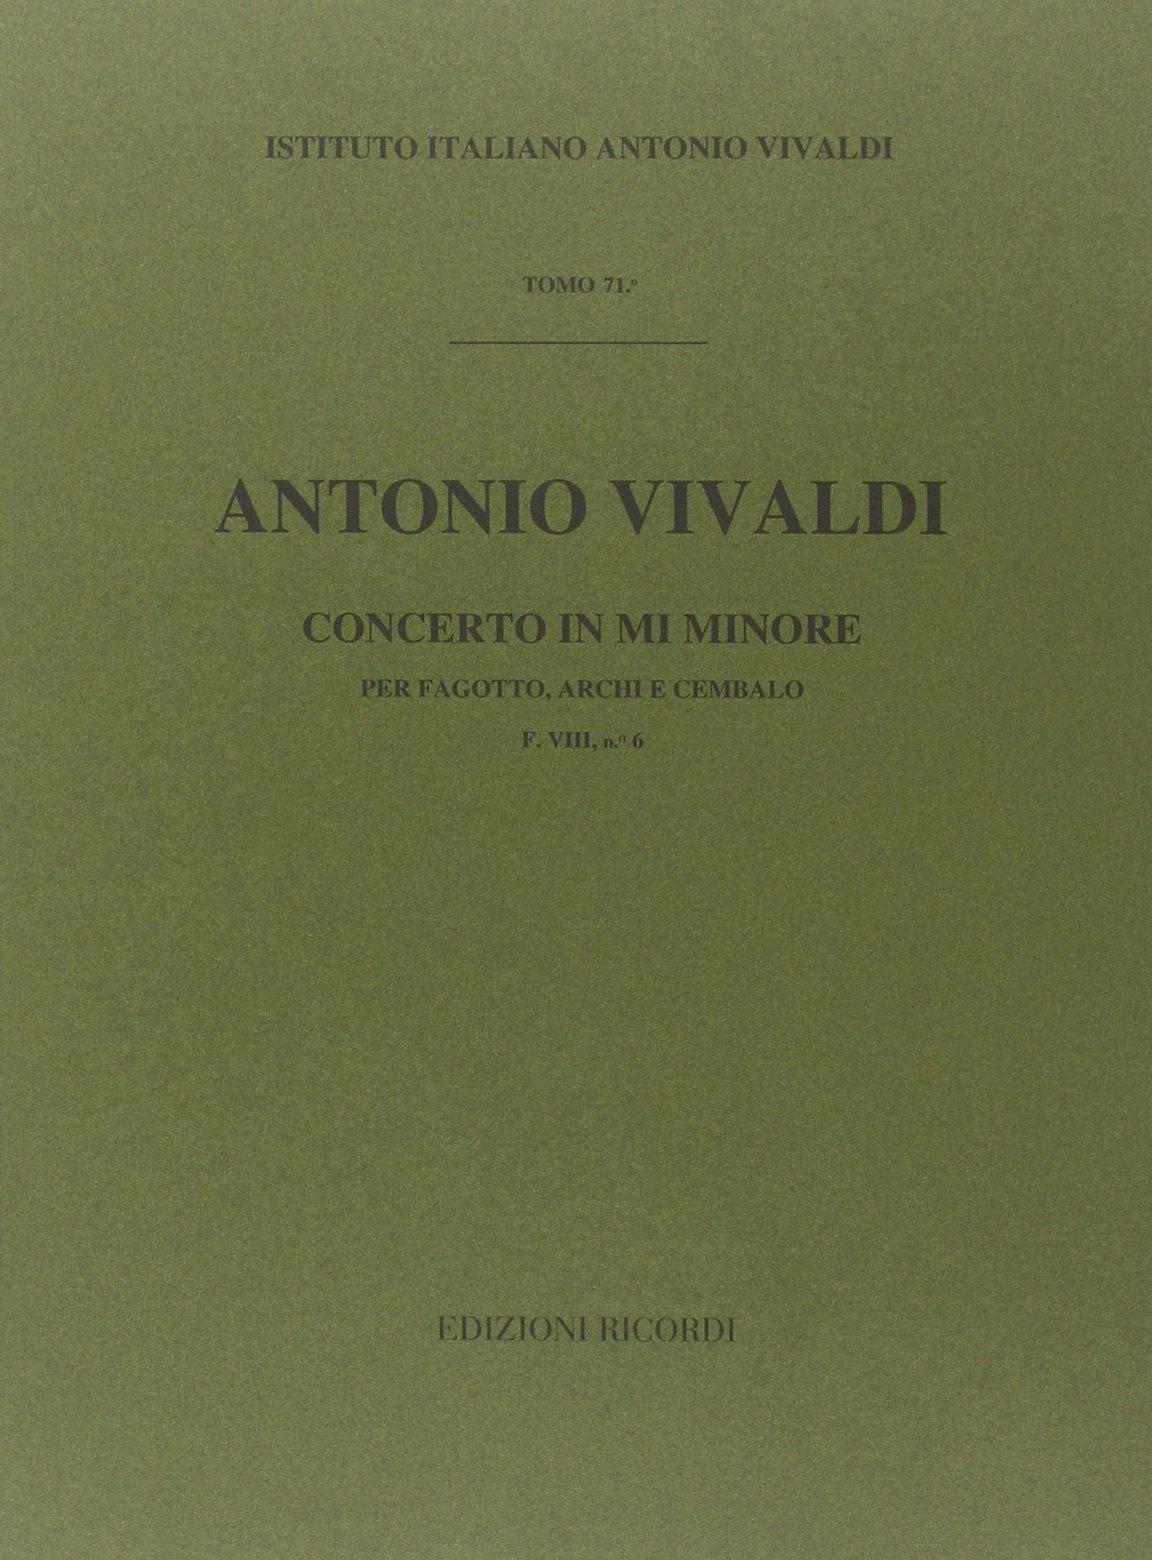 Concerto in mi minore Broché – 1 janvier 1970 Antonio Vivaldi Ricordi 0041903587 Musique